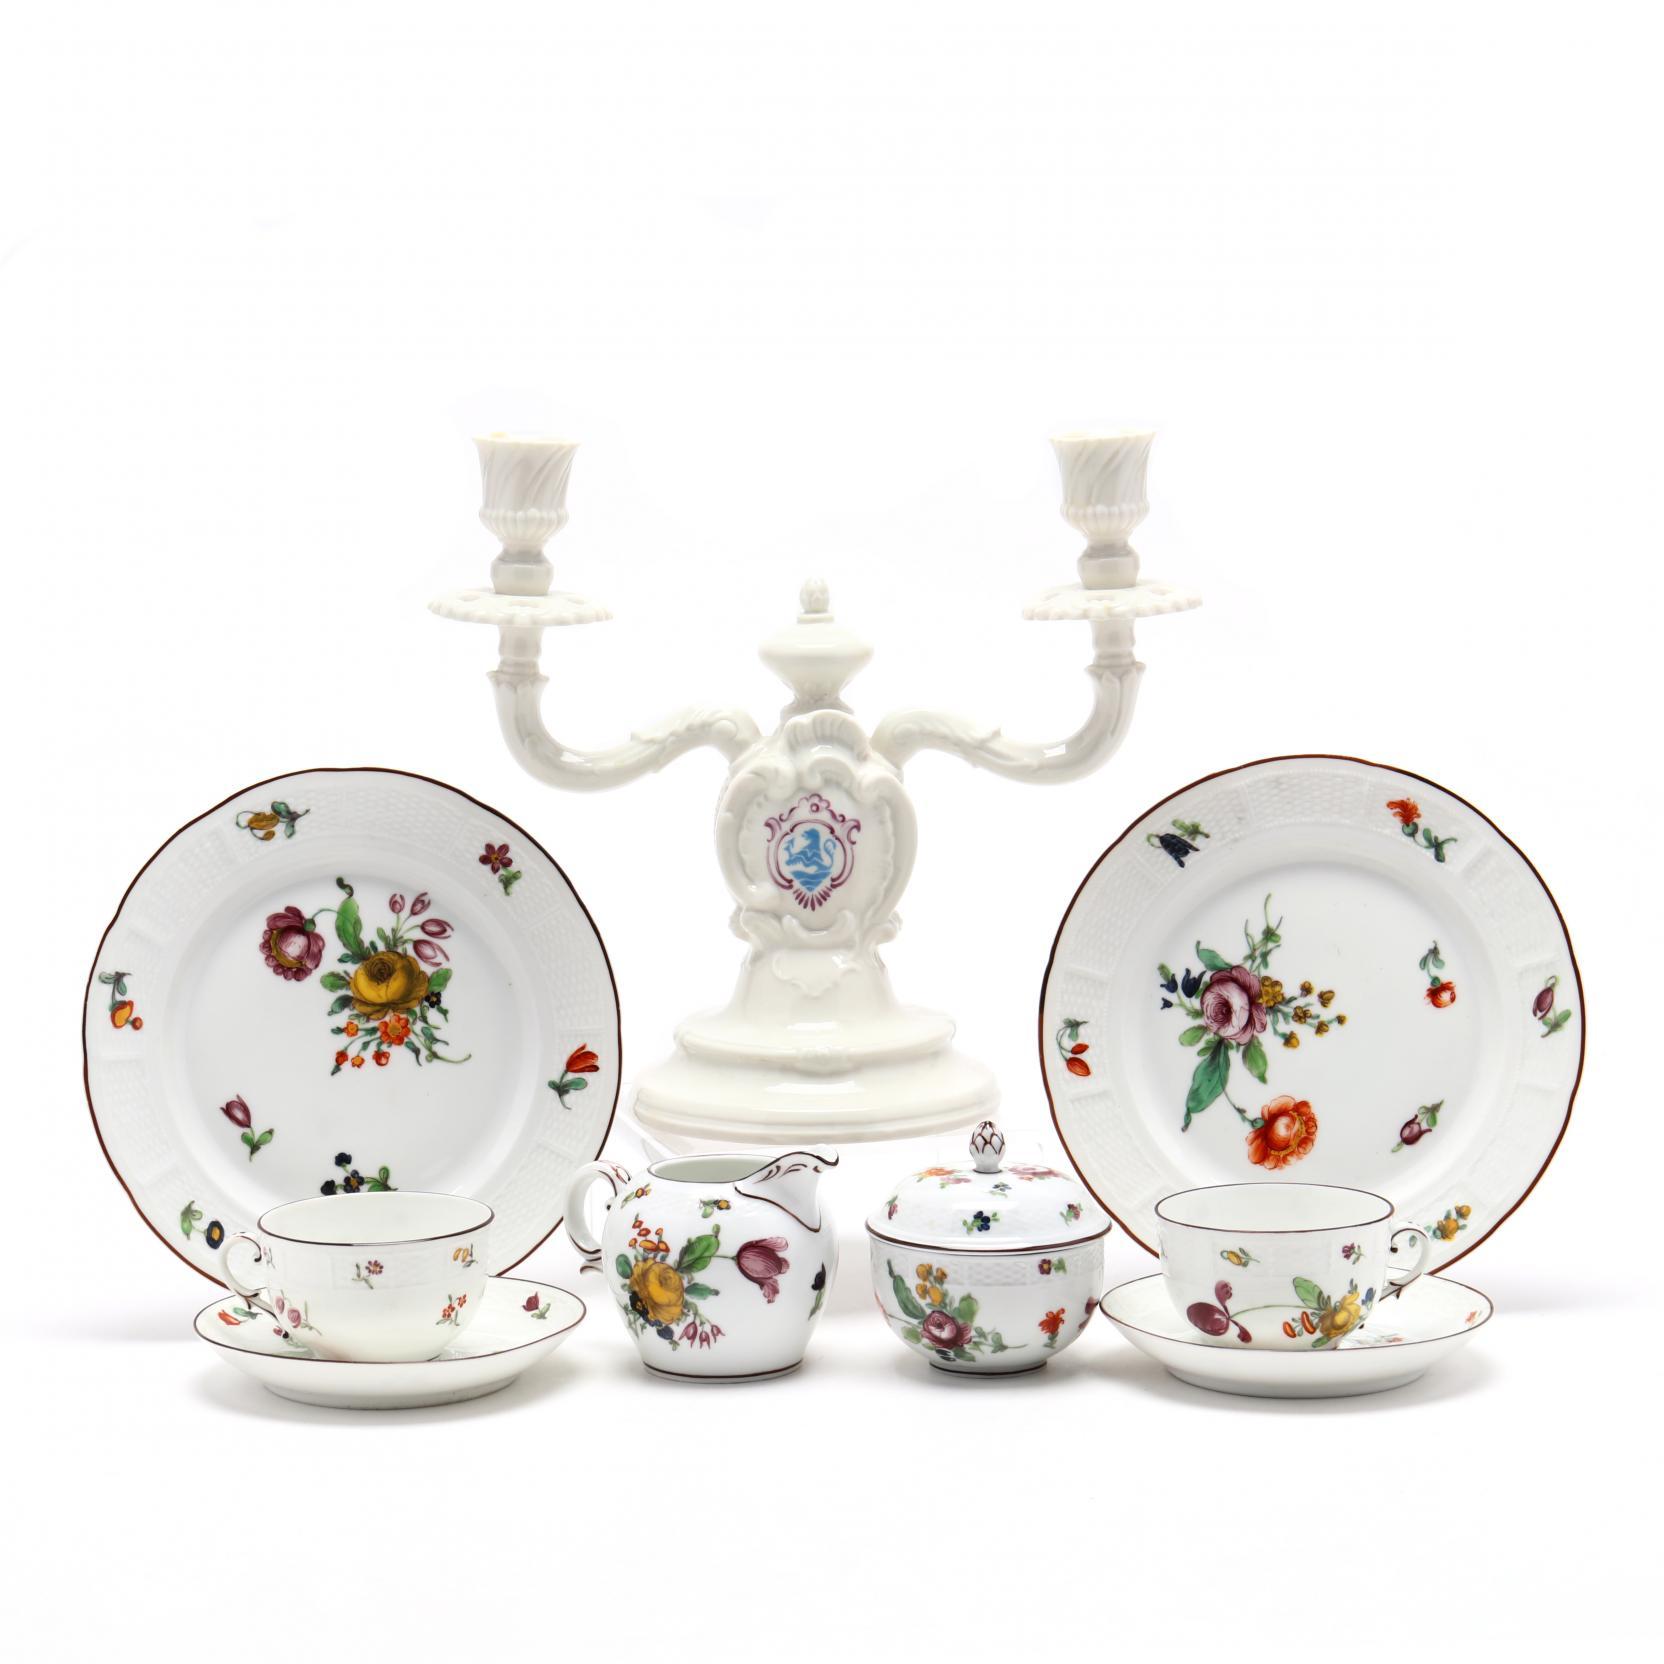 nymphenburg-porcelain-i-tete-a-tete-i-set-and-candelabrum